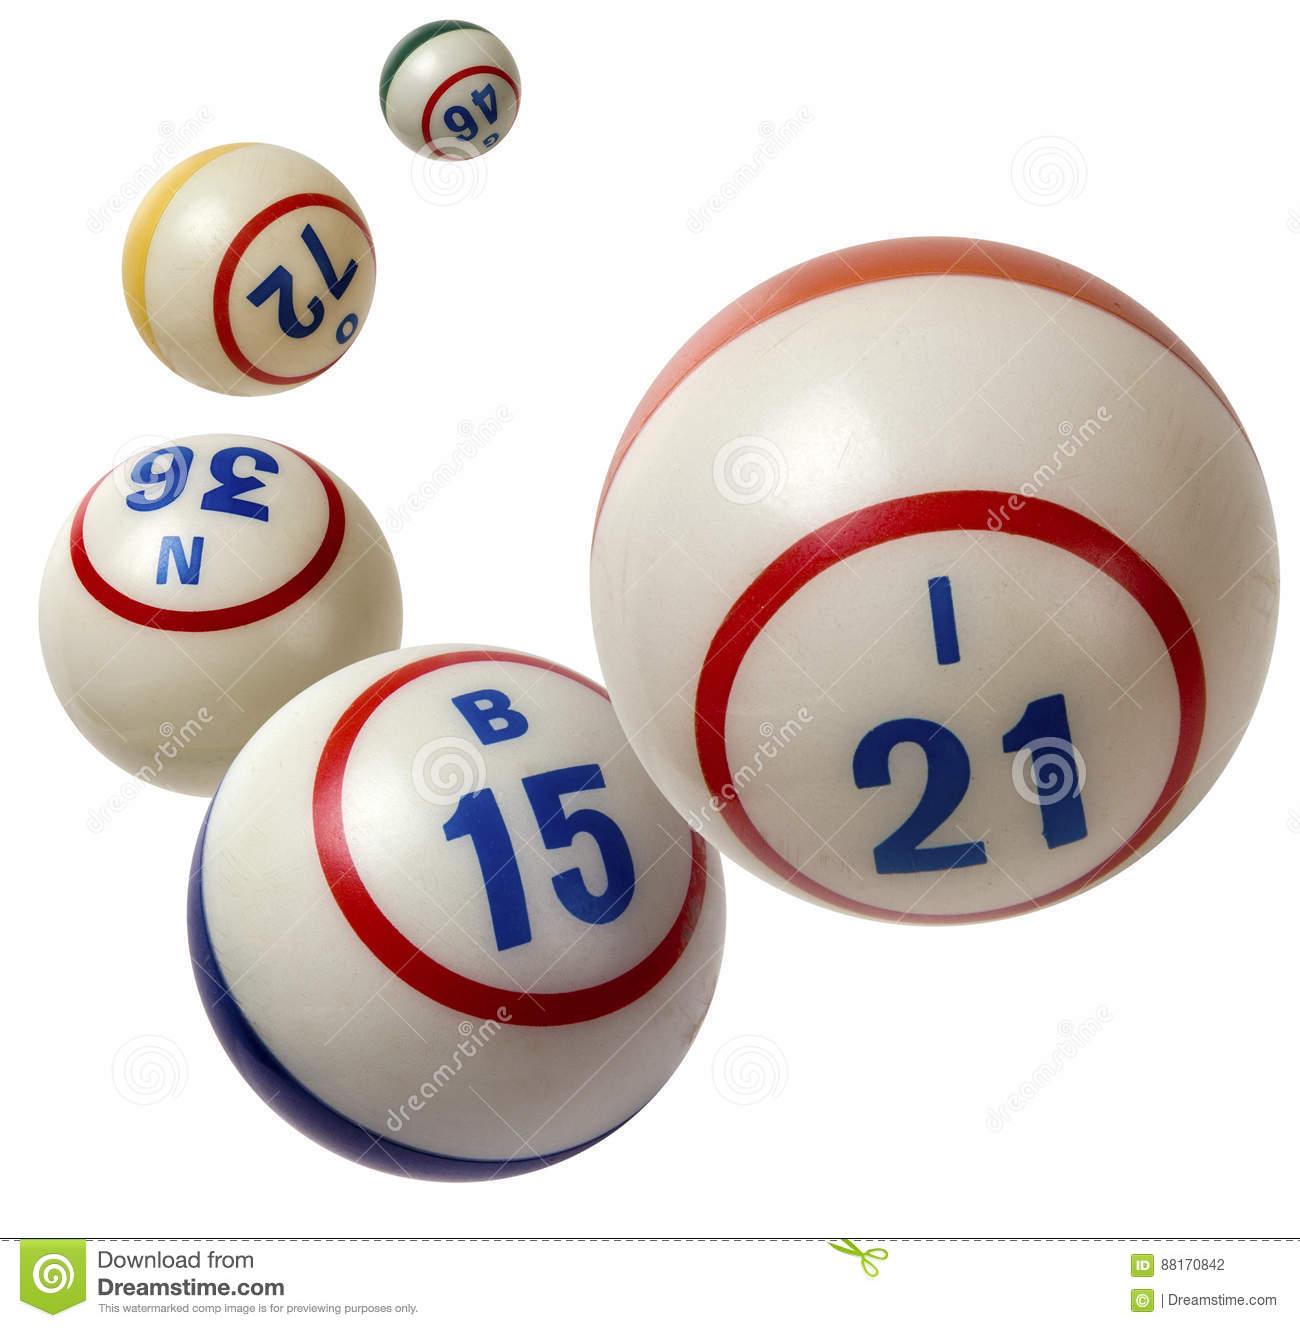 Bingo Balls stock photo. Image of white, games, gambling.